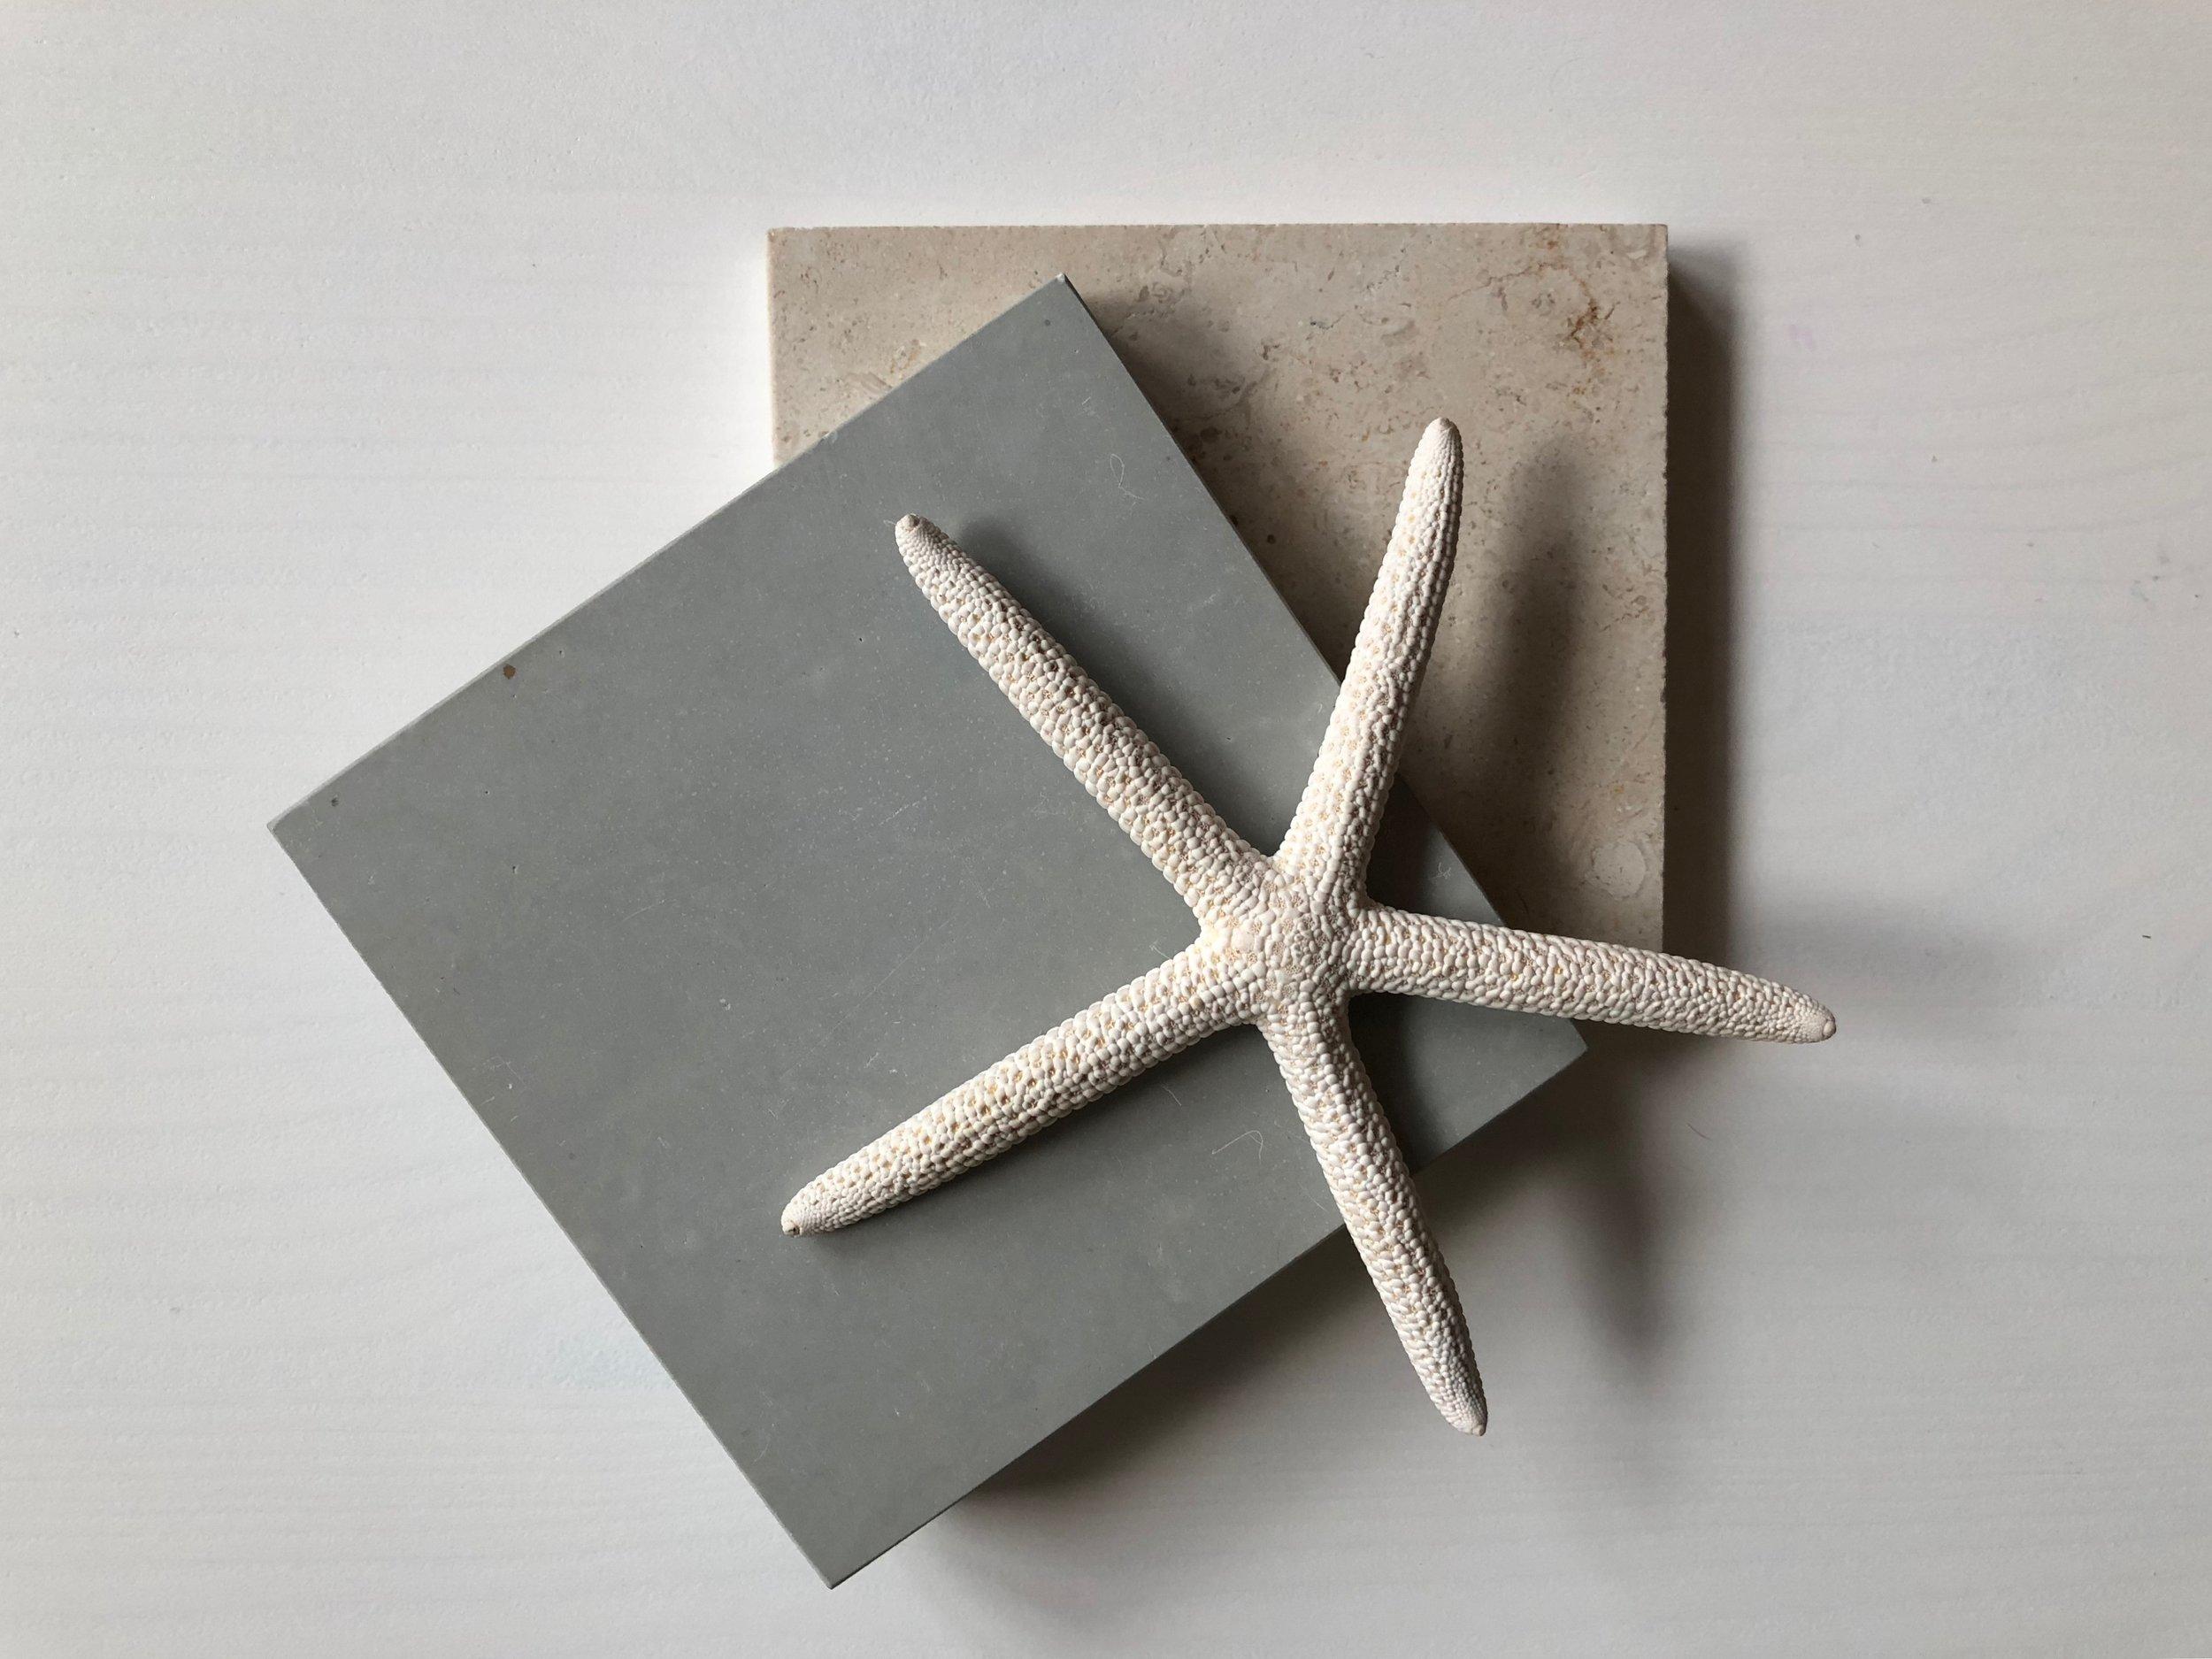 Rosenthal slipad. Crema Marfi marmor